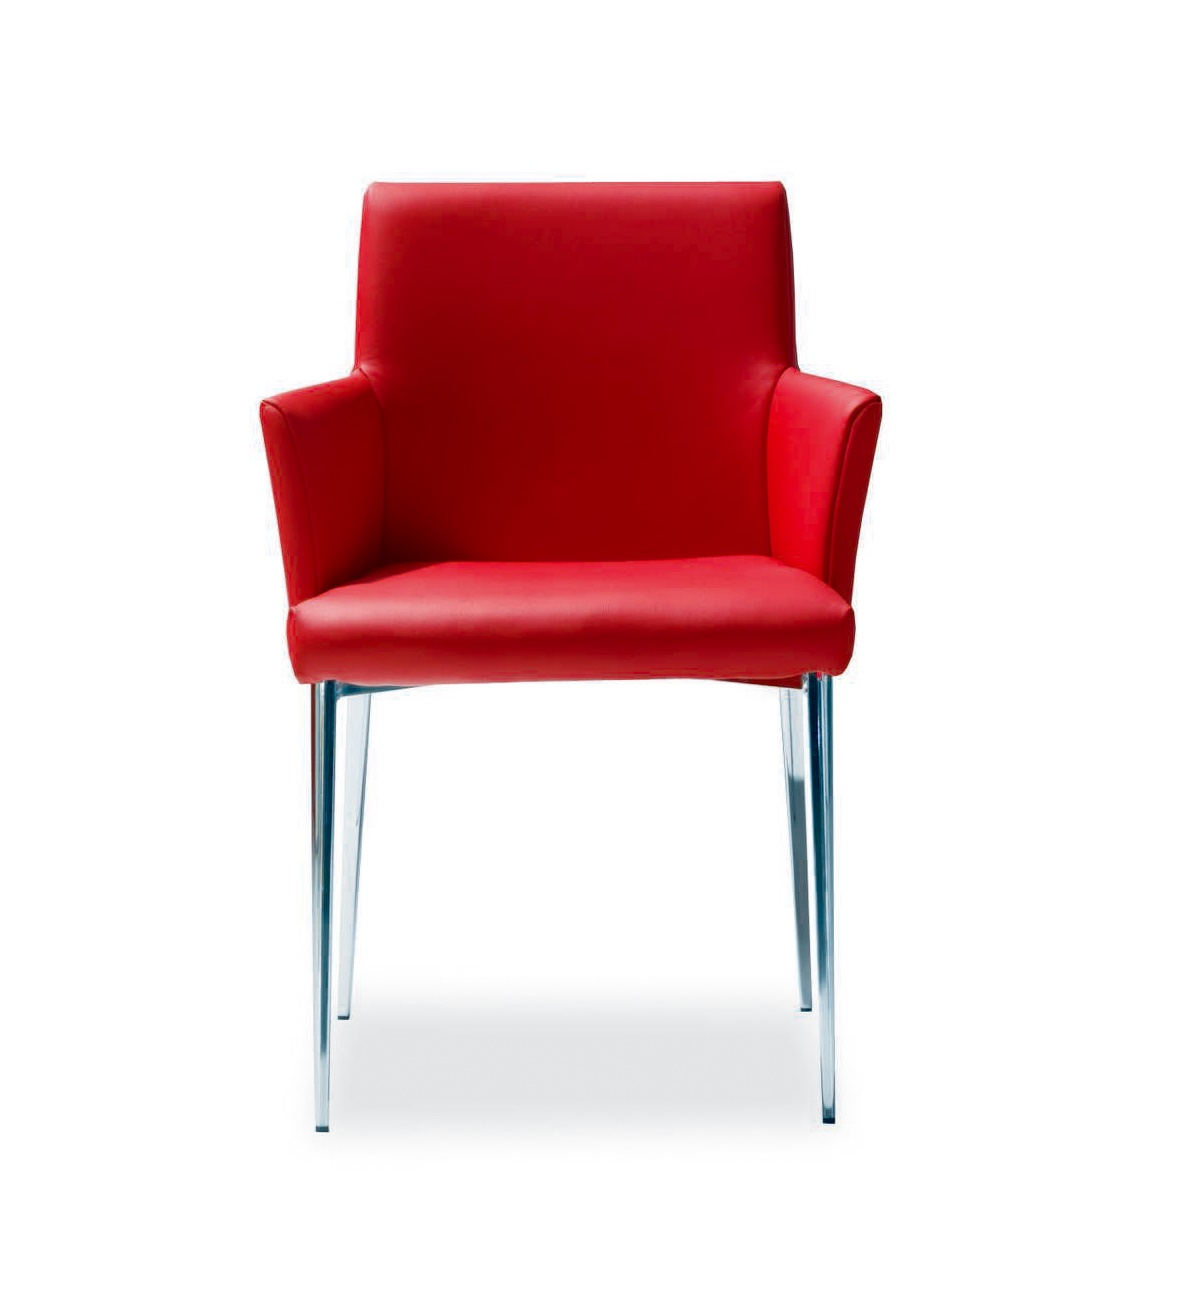 Mila Armchair, Bontempi Chairs